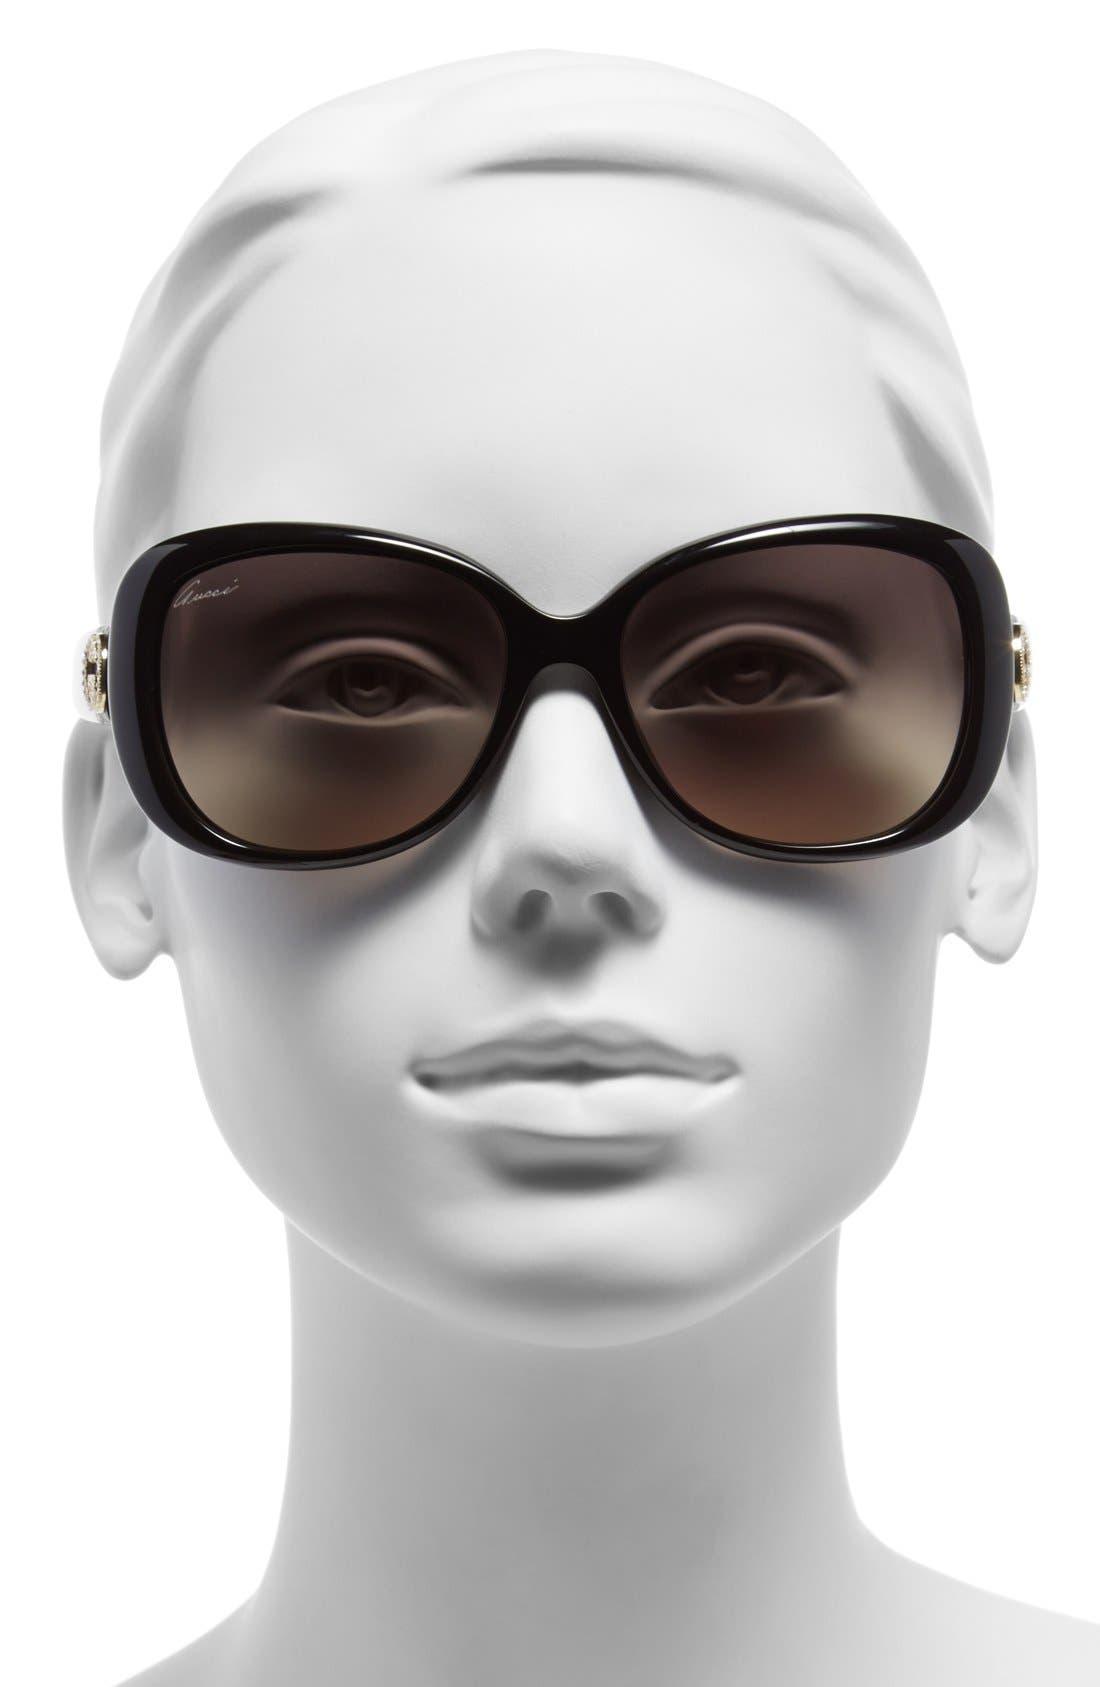 56mm Swarovski Crystal Sunglasses,                             Alternate thumbnail 2, color,                             001